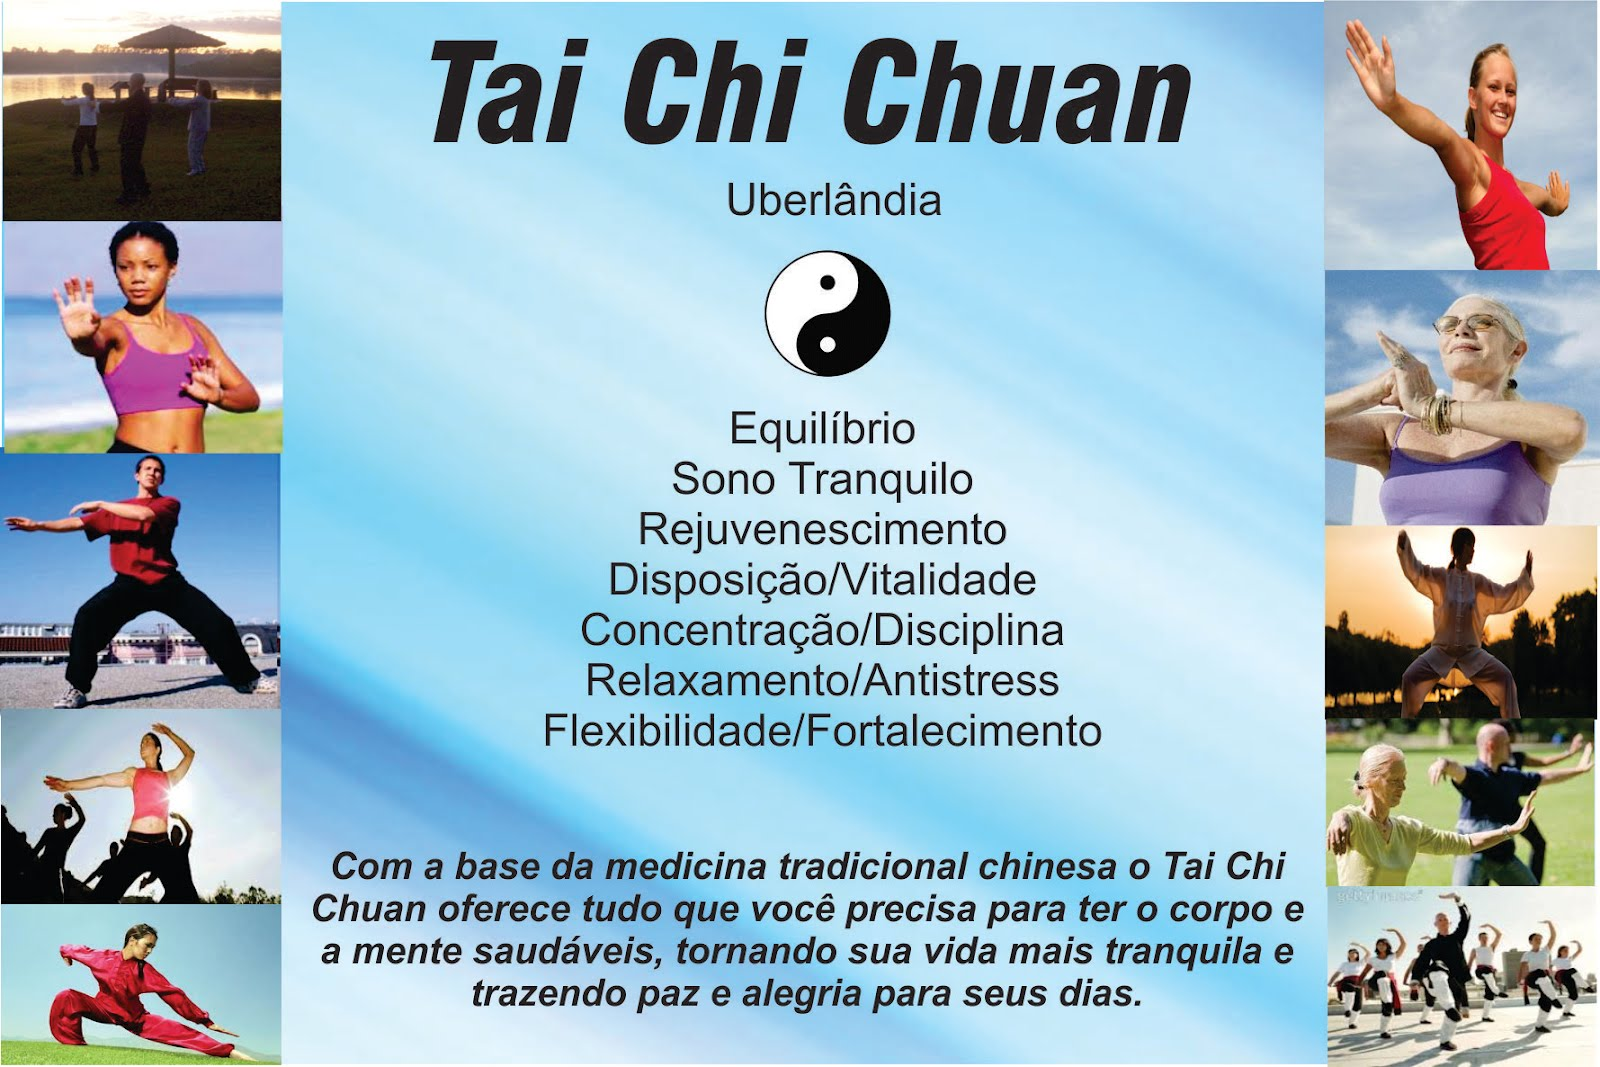 TAI CHI CHUAN UBERLÂNDIA